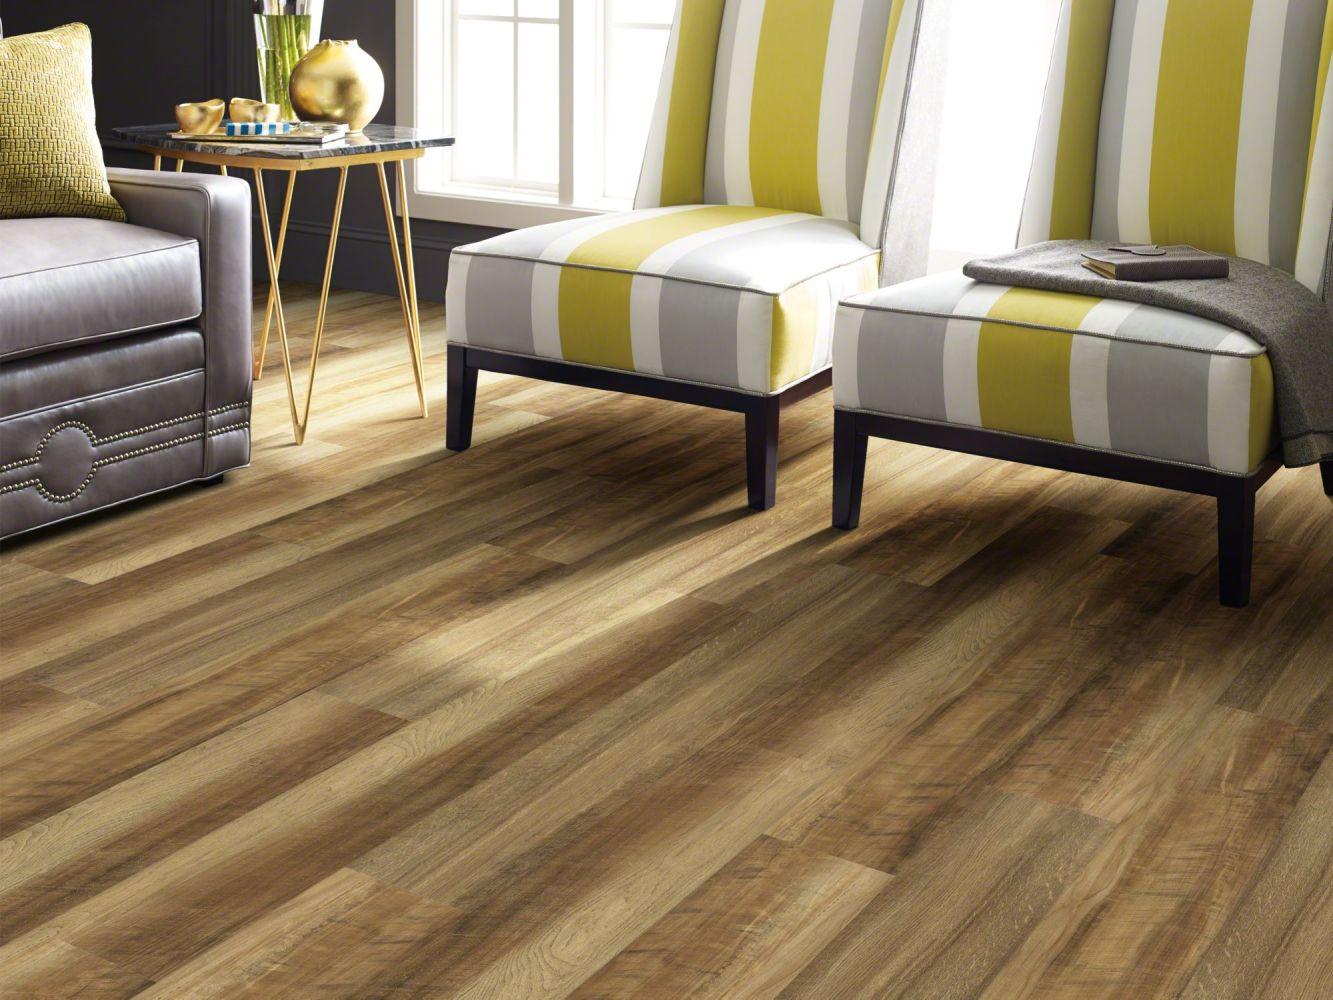 Shaw Floors Dr Horton Ballantyne Plus Click Tawny Oak 00203_DR036